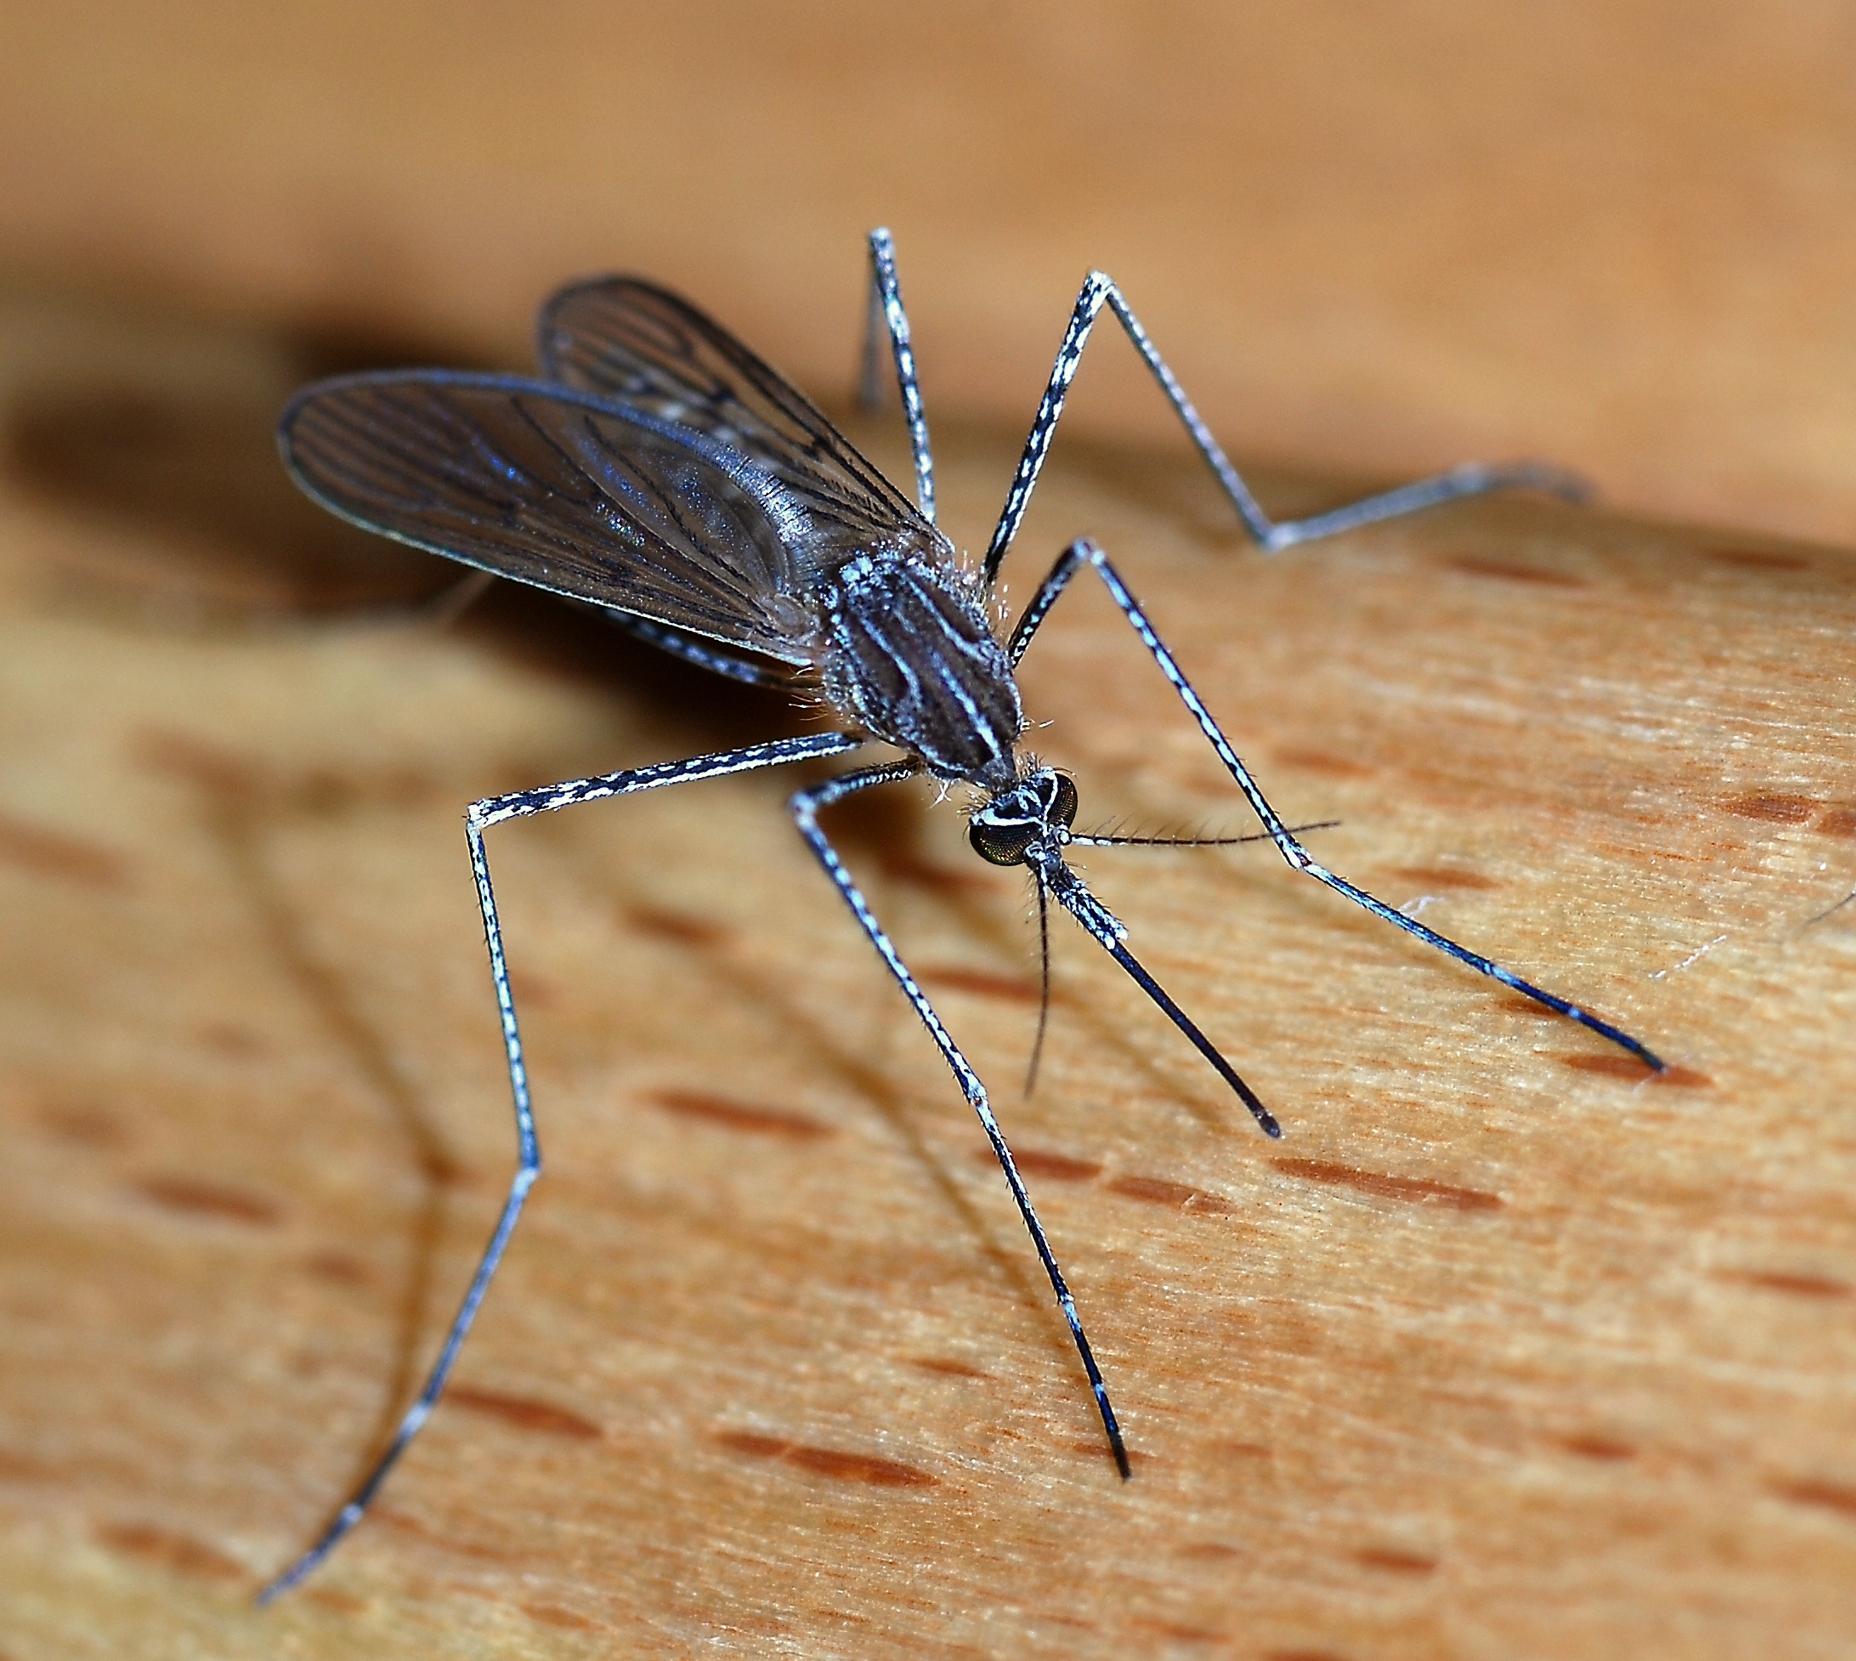 Mosquito - Wikipedia